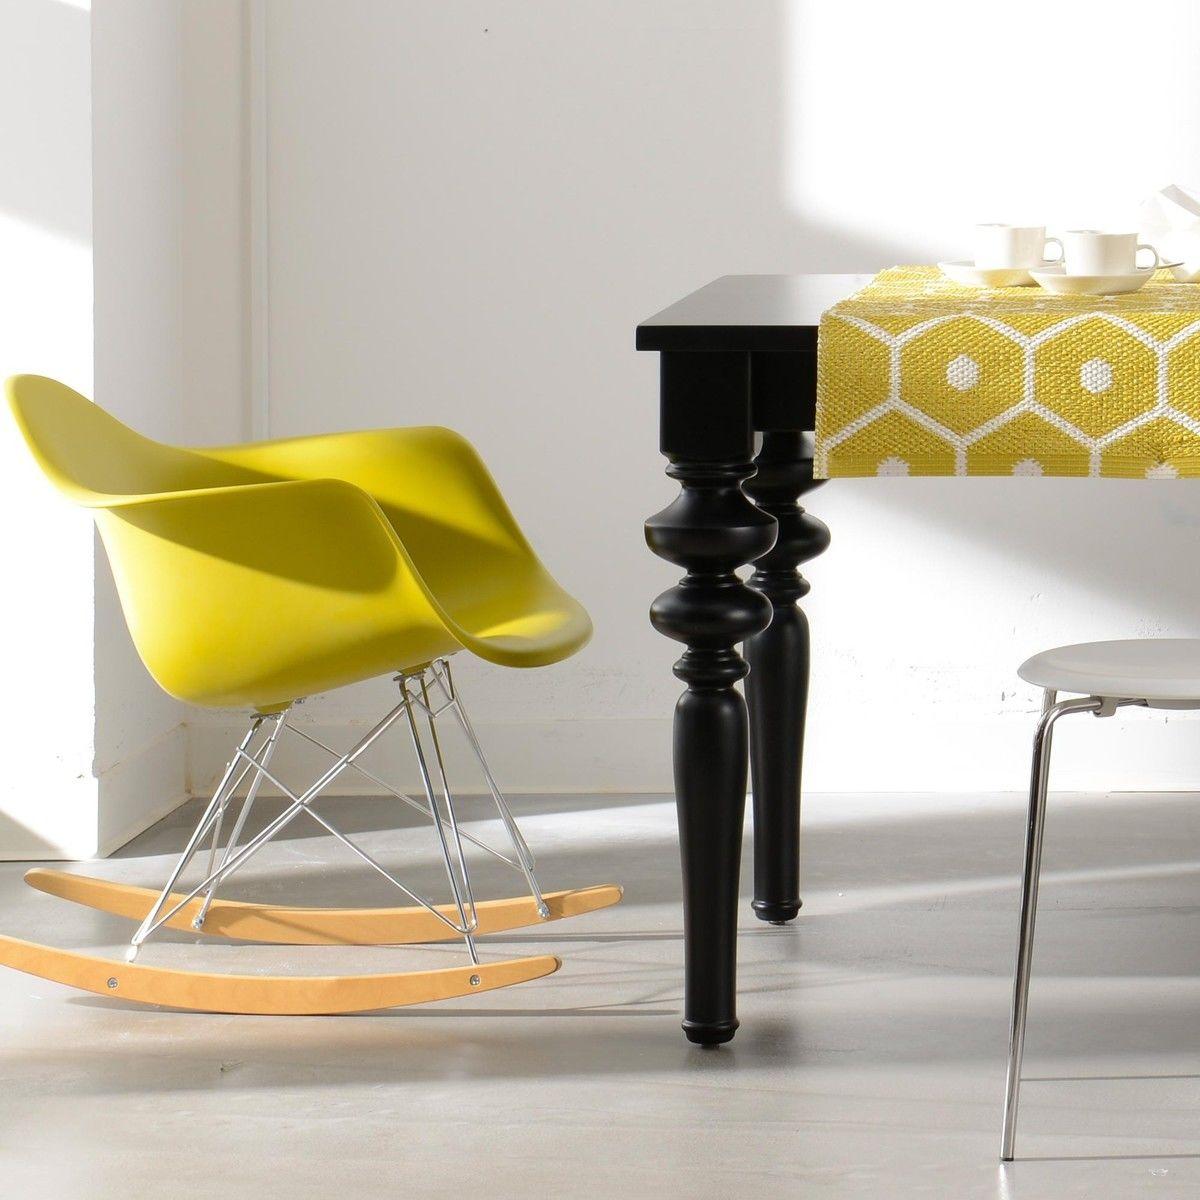 veneziano echtholzesstisch adwood ambientedirectcom. Black Bedroom Furniture Sets. Home Design Ideas